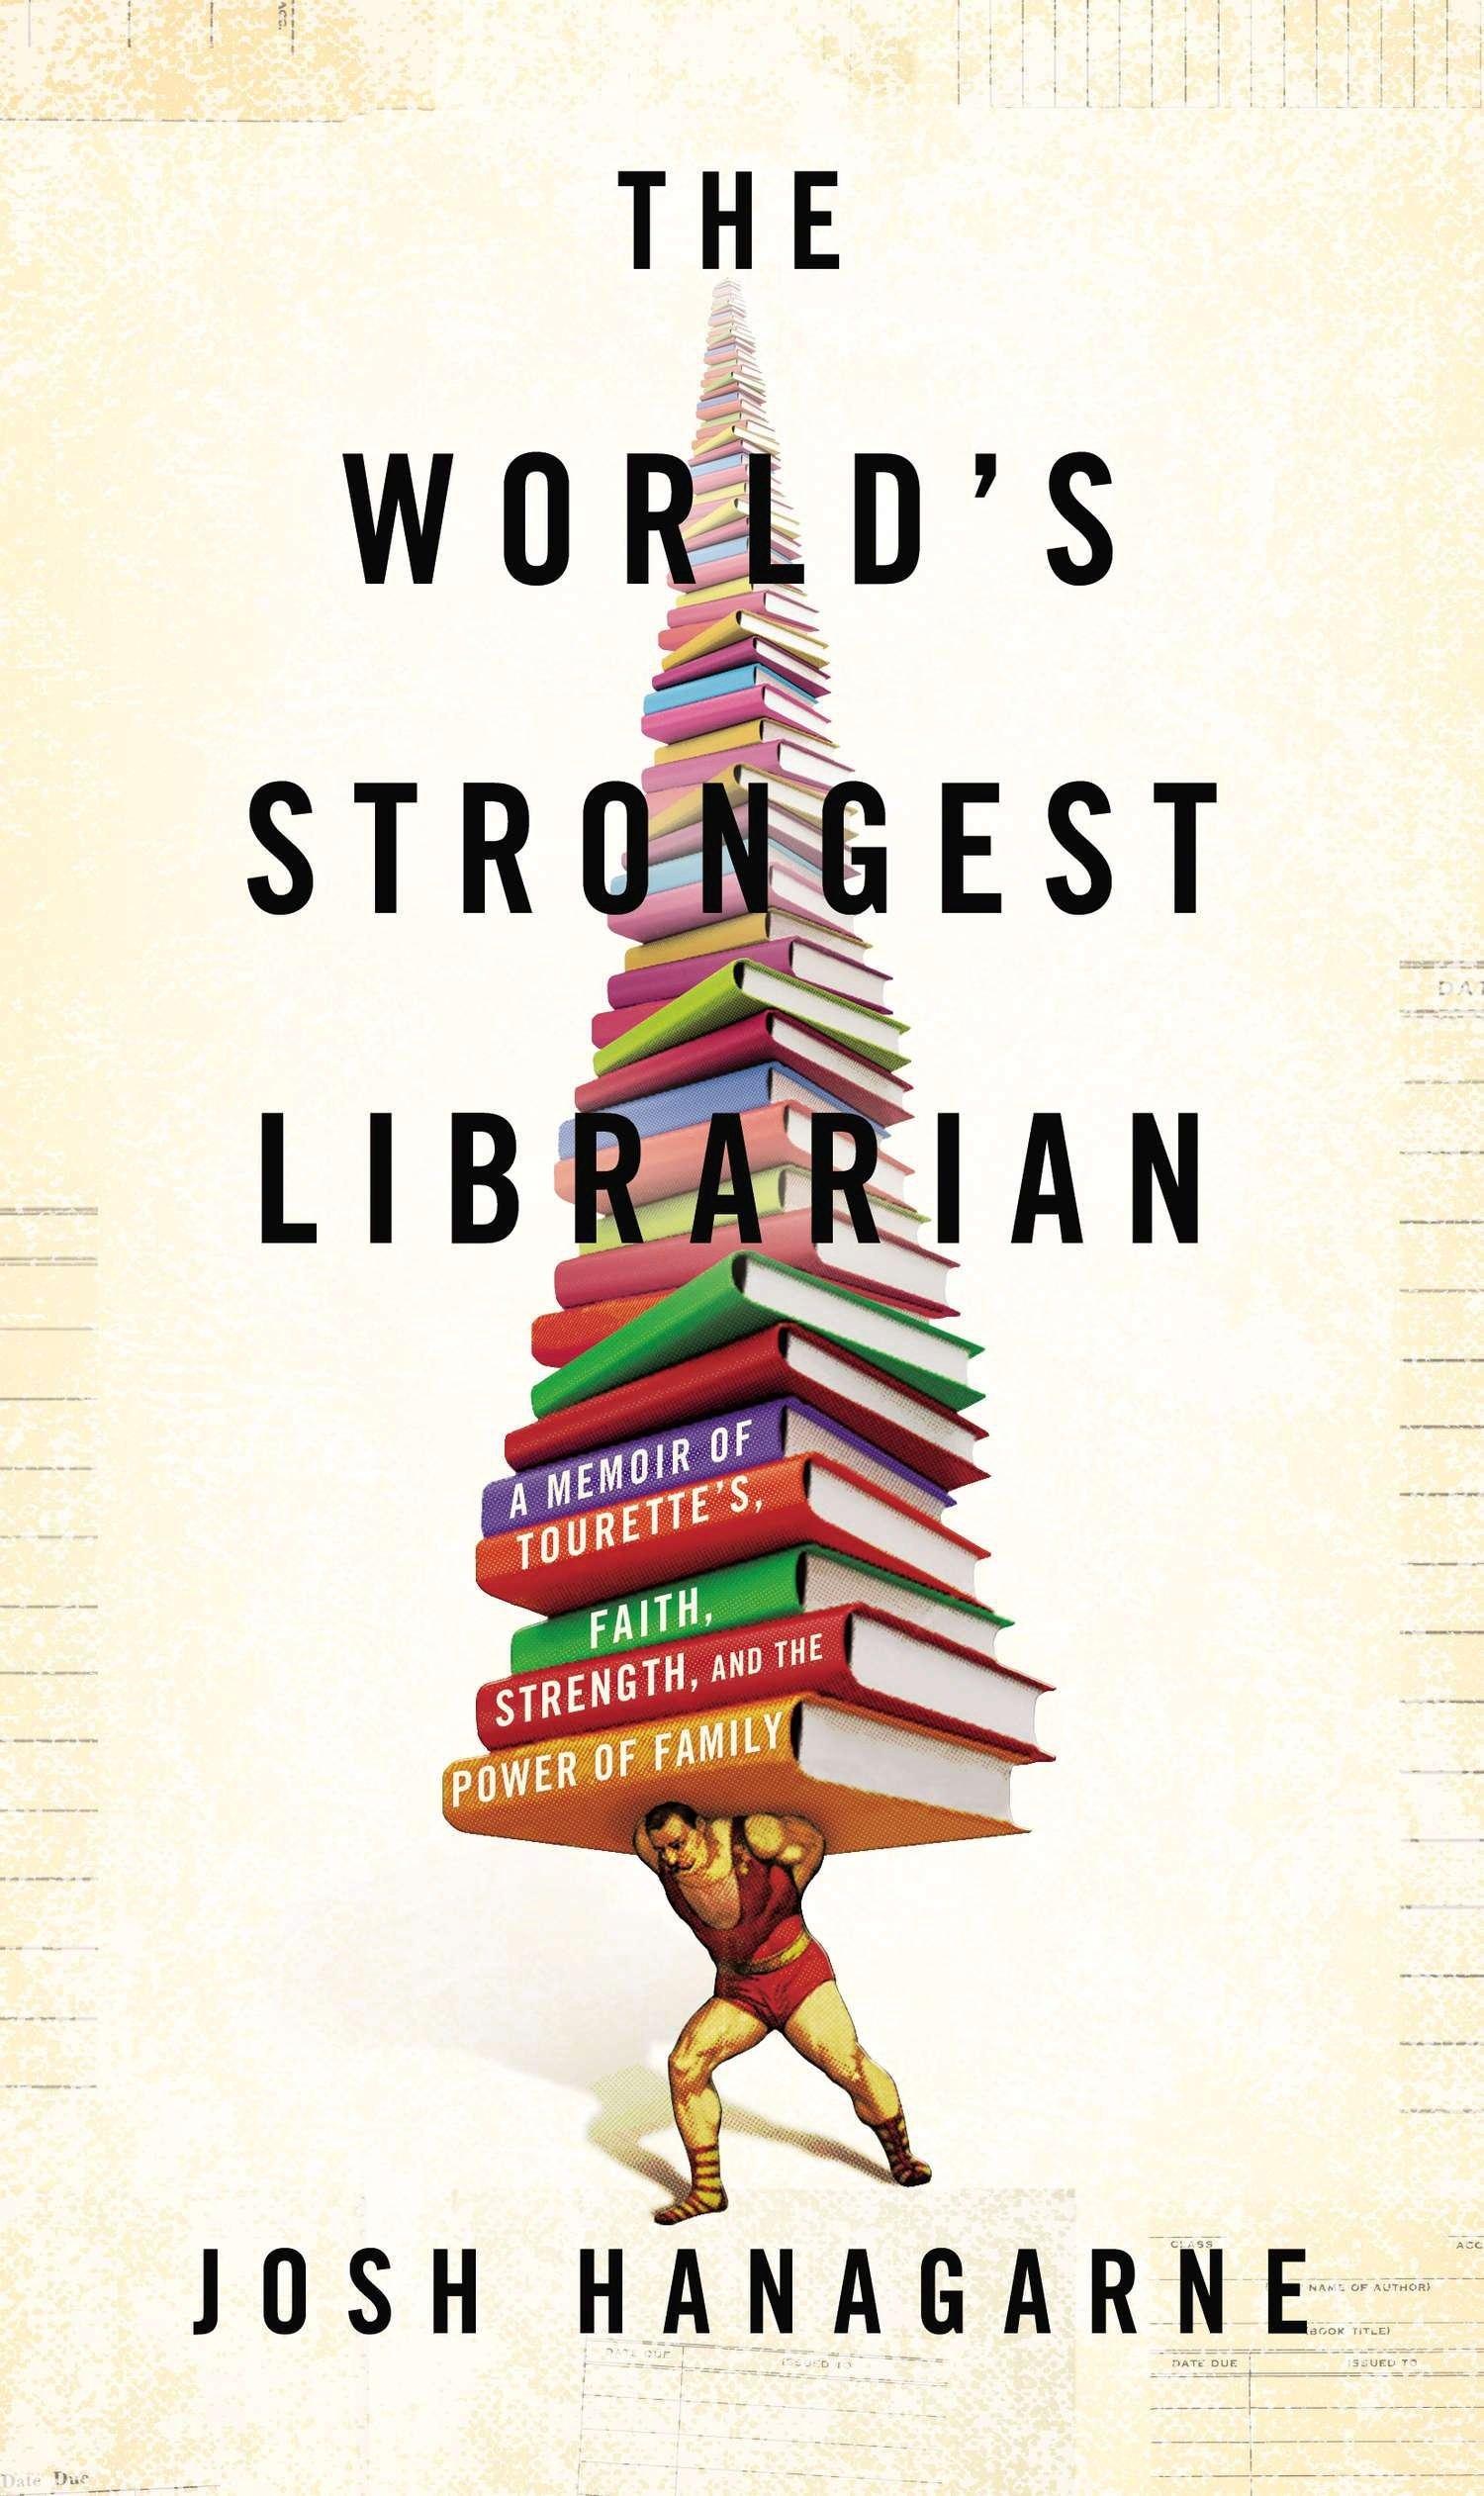 Amazon.com: The World's Strongest Librarian: A Memoir of Tourette's, Faith,  Strength, and the Power of Family (8601200649246): Hanagarne, Josh: Books